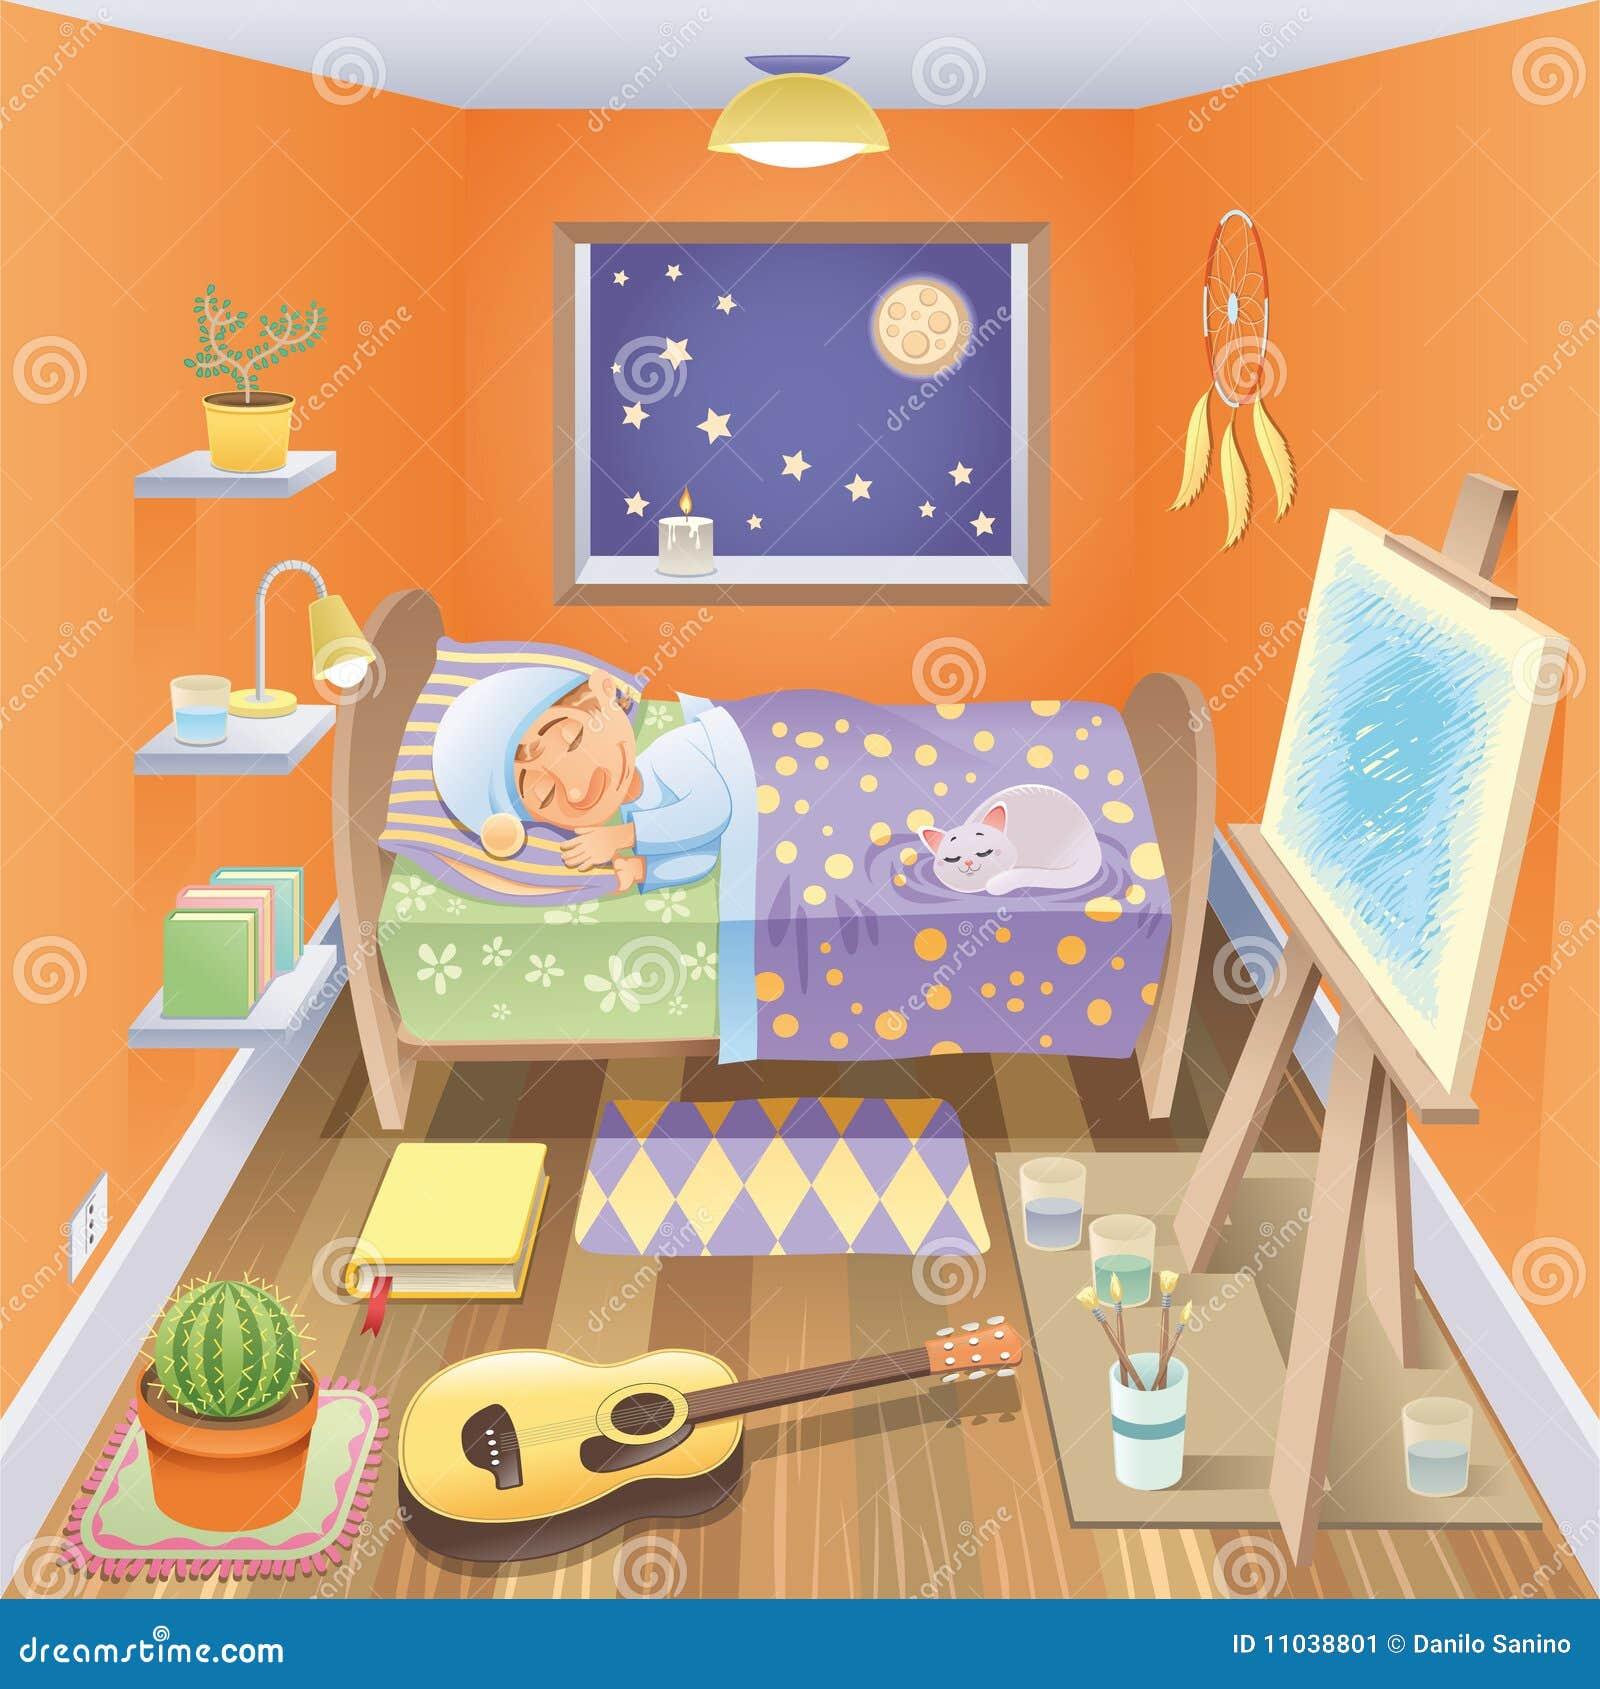 le gar on dort dans sa chambre coucher illustration de vecteur illustration du illustration. Black Bedroom Furniture Sets. Home Design Ideas